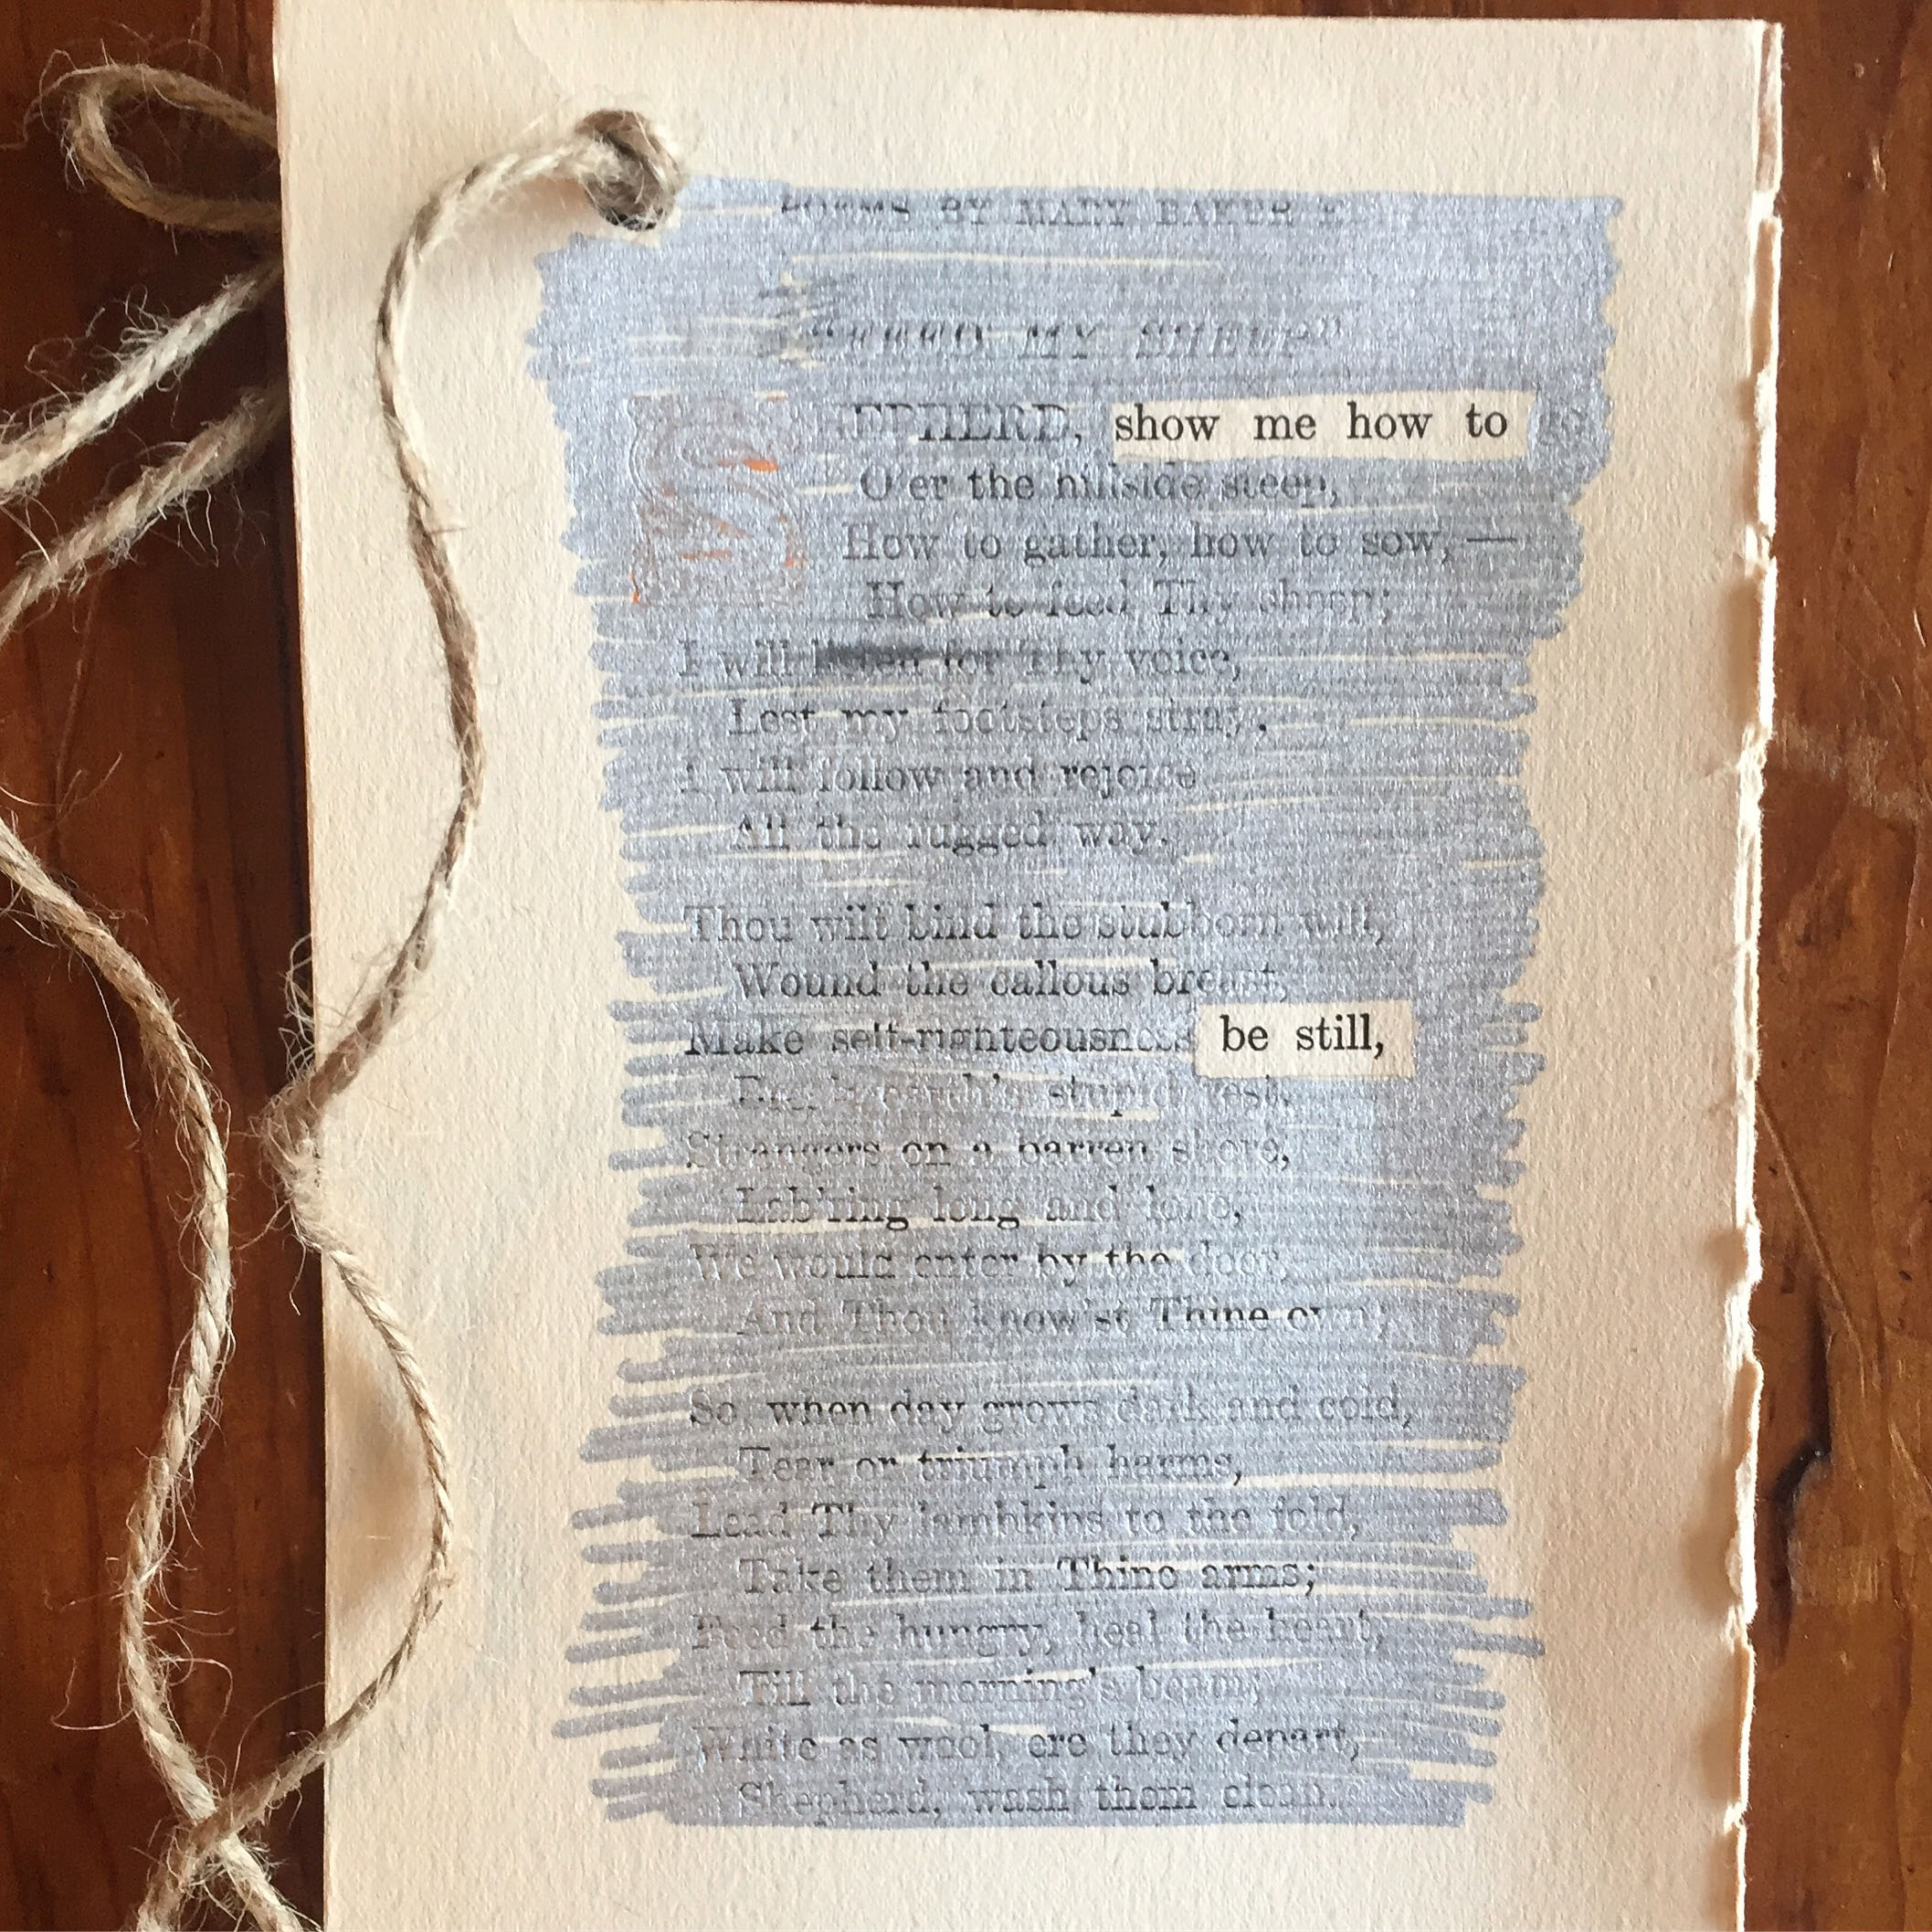 Be Still, an erasure poem by Drew Myron